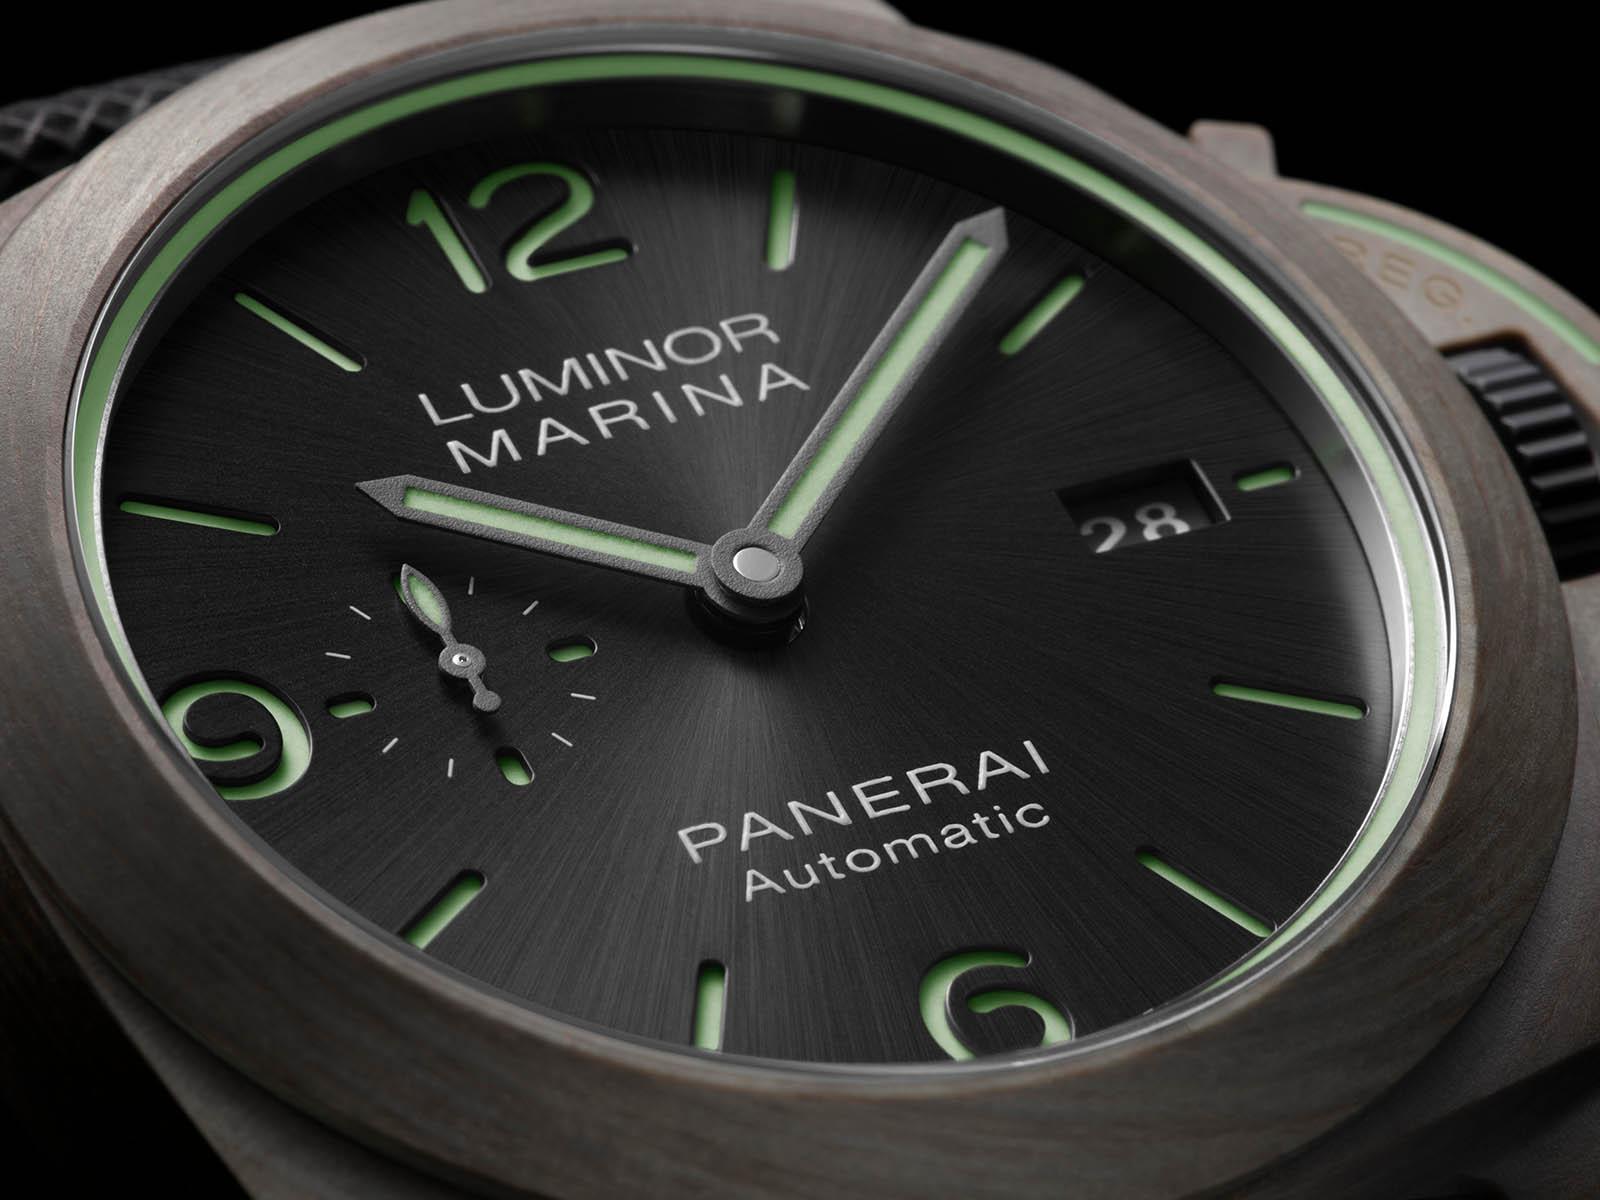 pam01119-officine-panerai-luminor-marina-fibratech-44mm-2.jpg